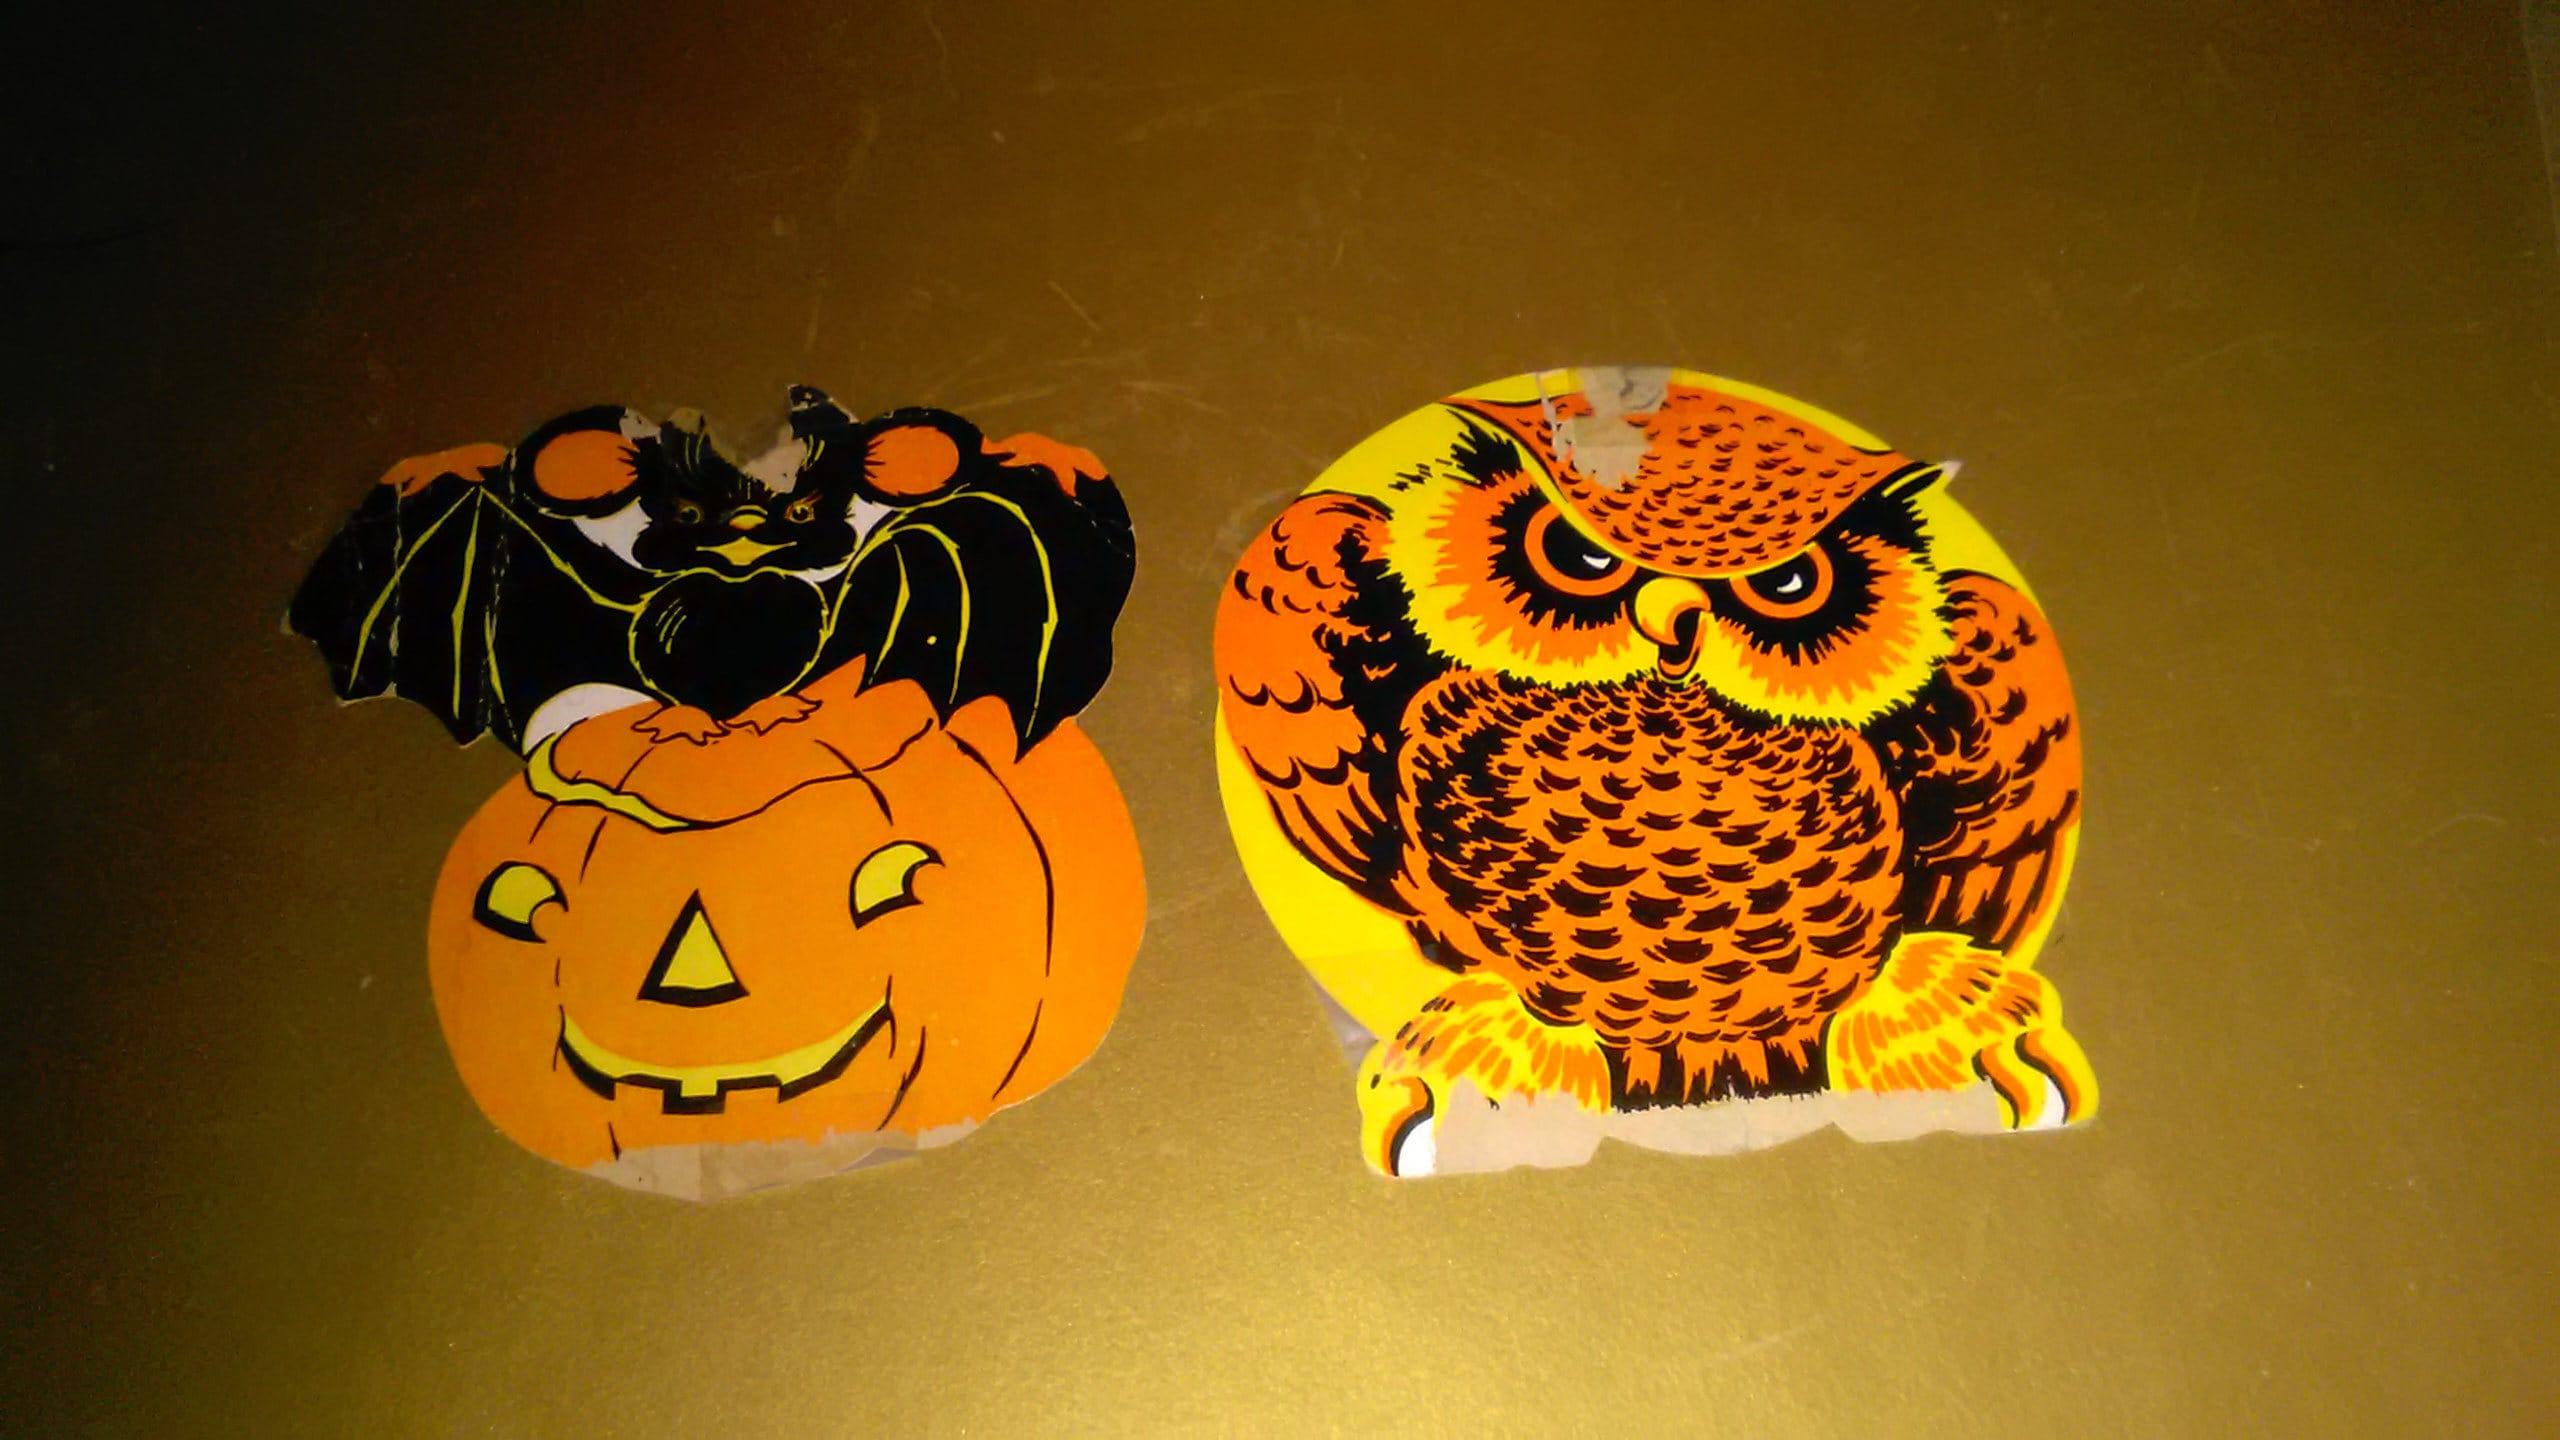 Vintage Halloween Decorations Beistle Die Cuts Jointed 1940s